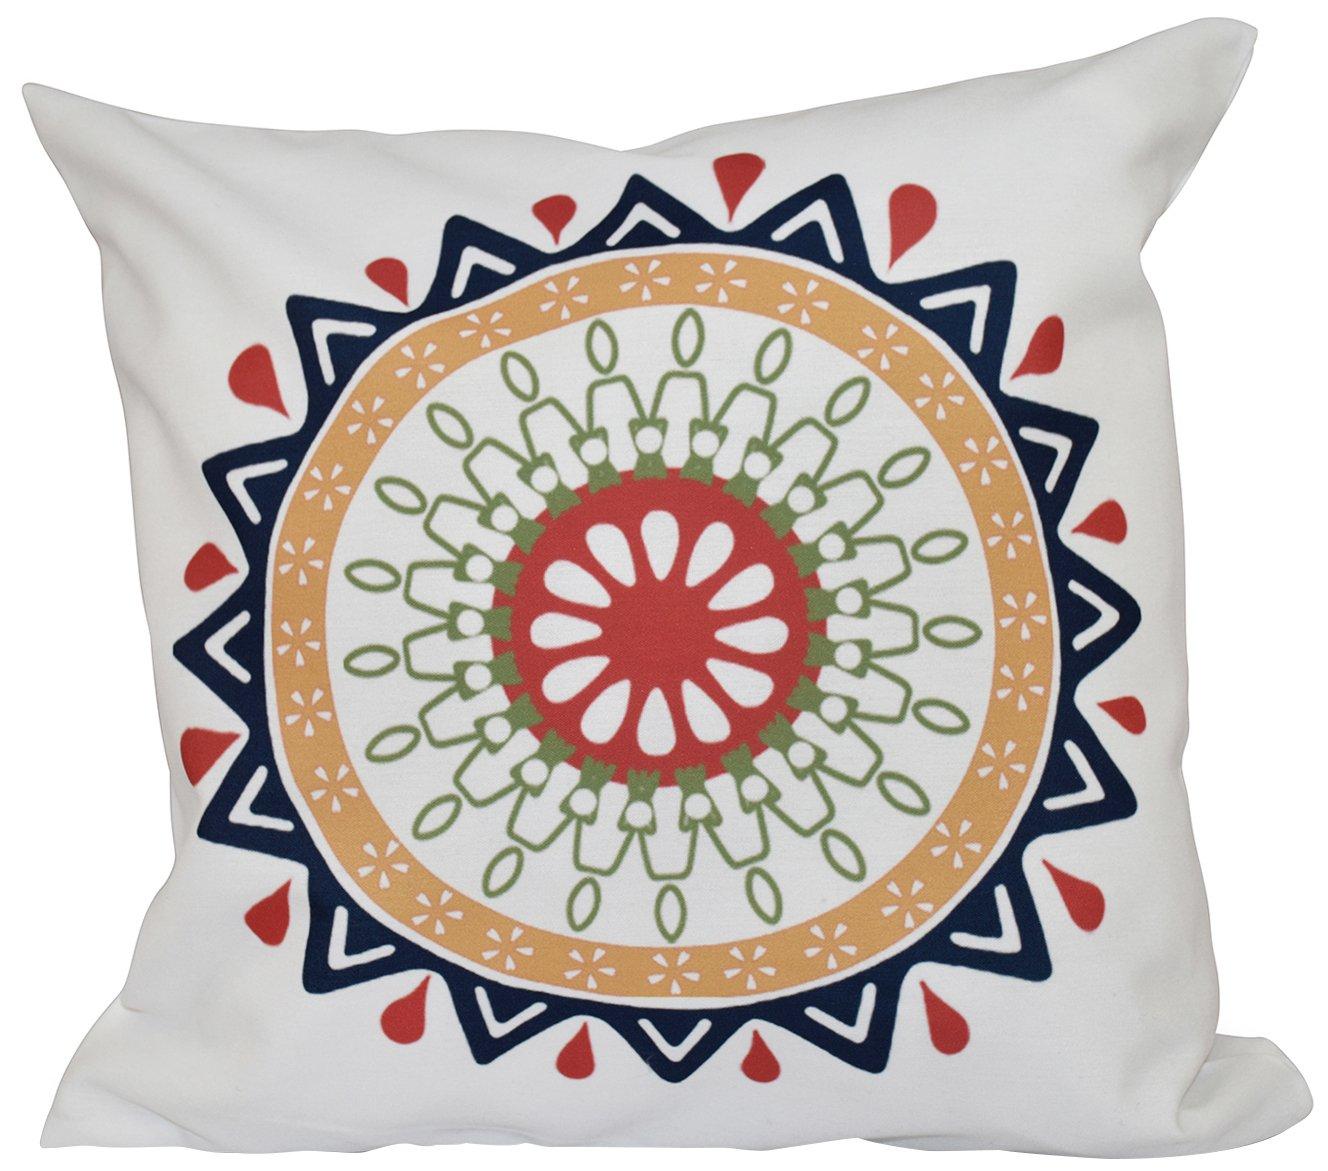 Kess InHouse Amanda Lane Gray Moroccan Grey White Round Floor Pillow 26